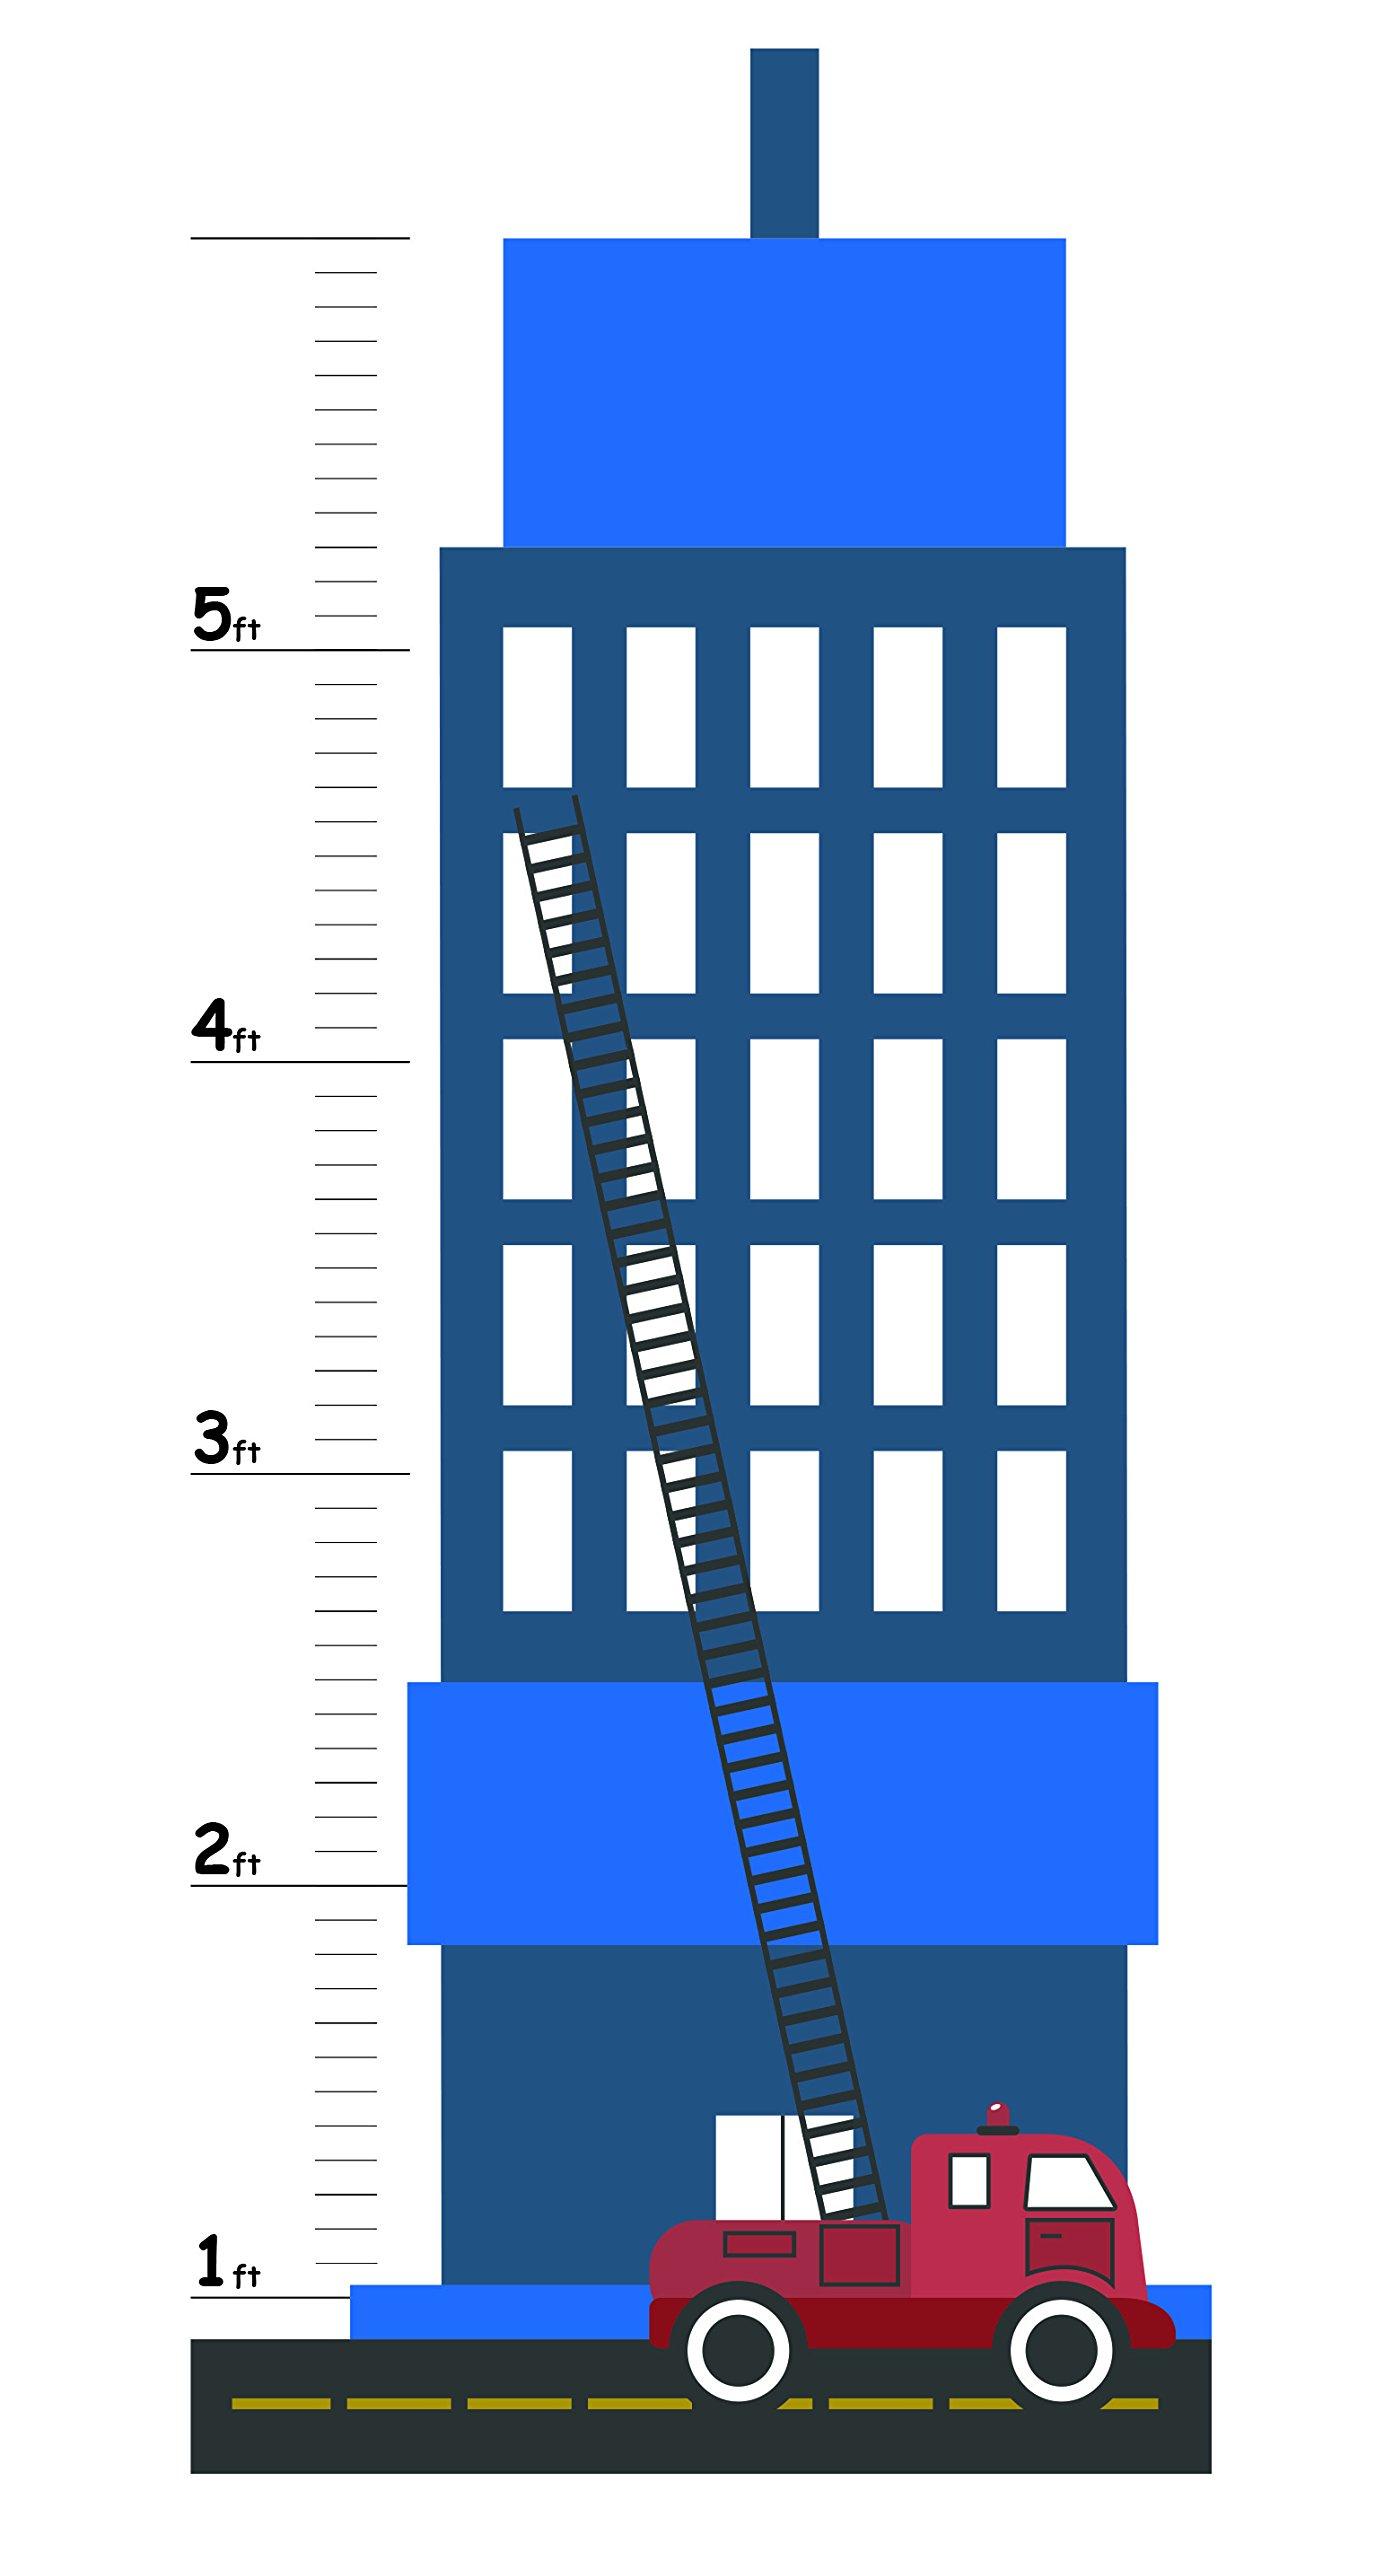 Growth Chart For Kids - Firetruck Growth Chart Decal - Height Chart For Kids Vinyl Decal - Firetruck Nursery Wall Decor - Height Measurement For Kids - Kids Height Wall Chart